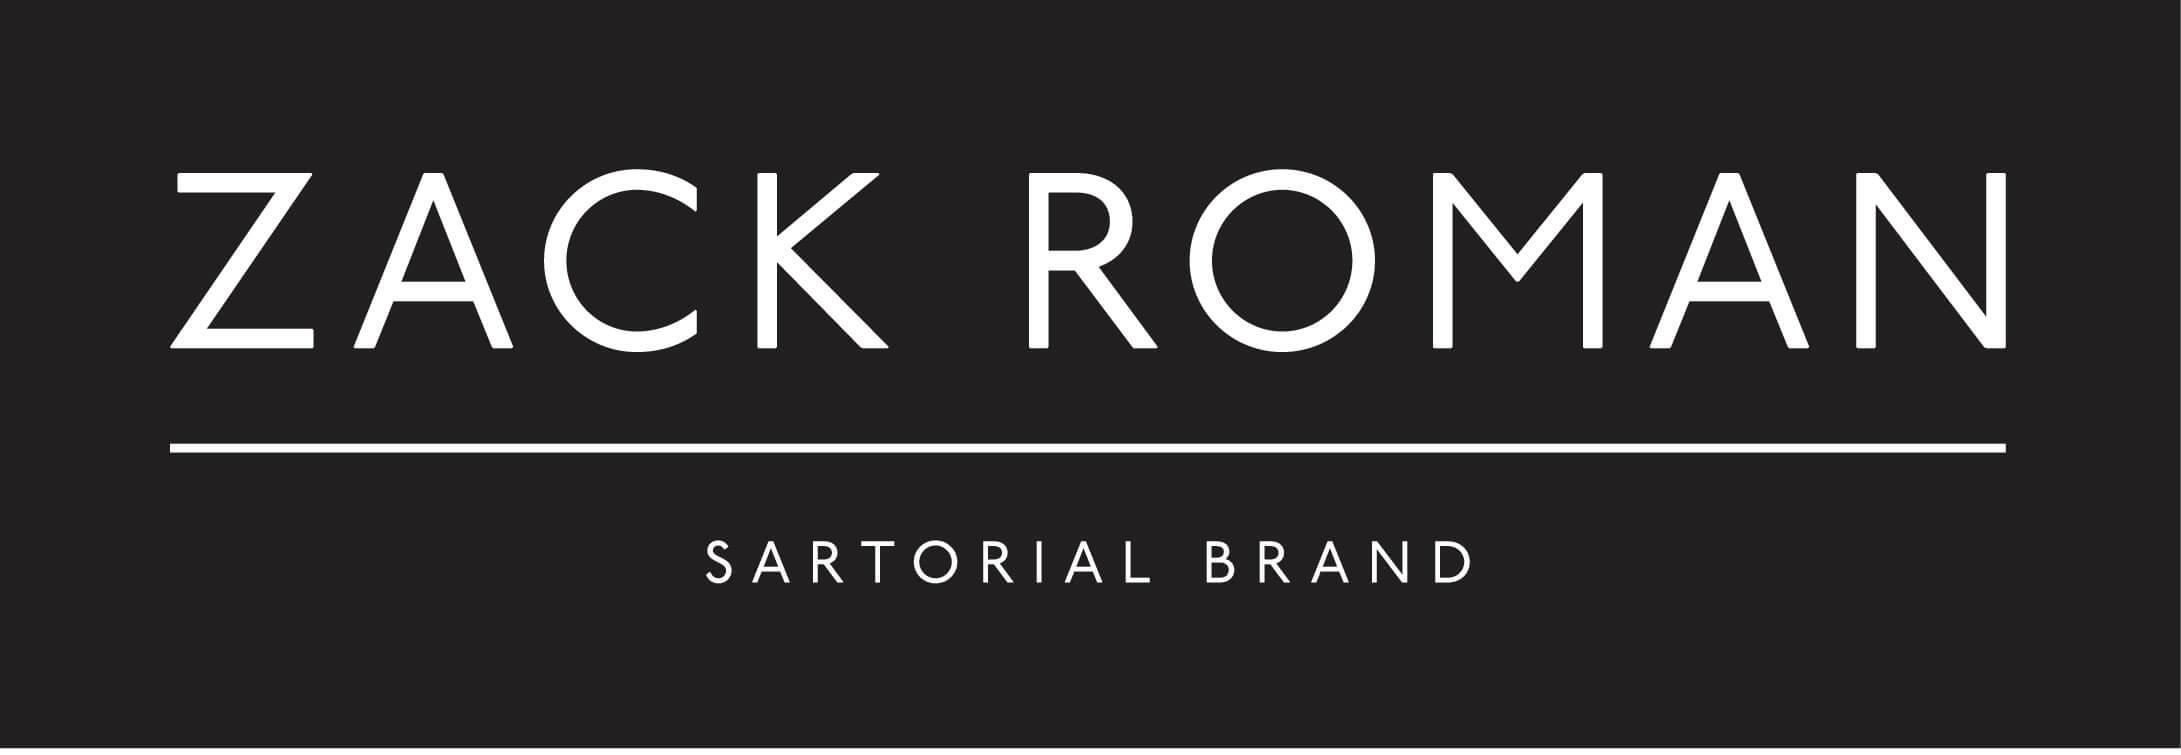 sartorial brand